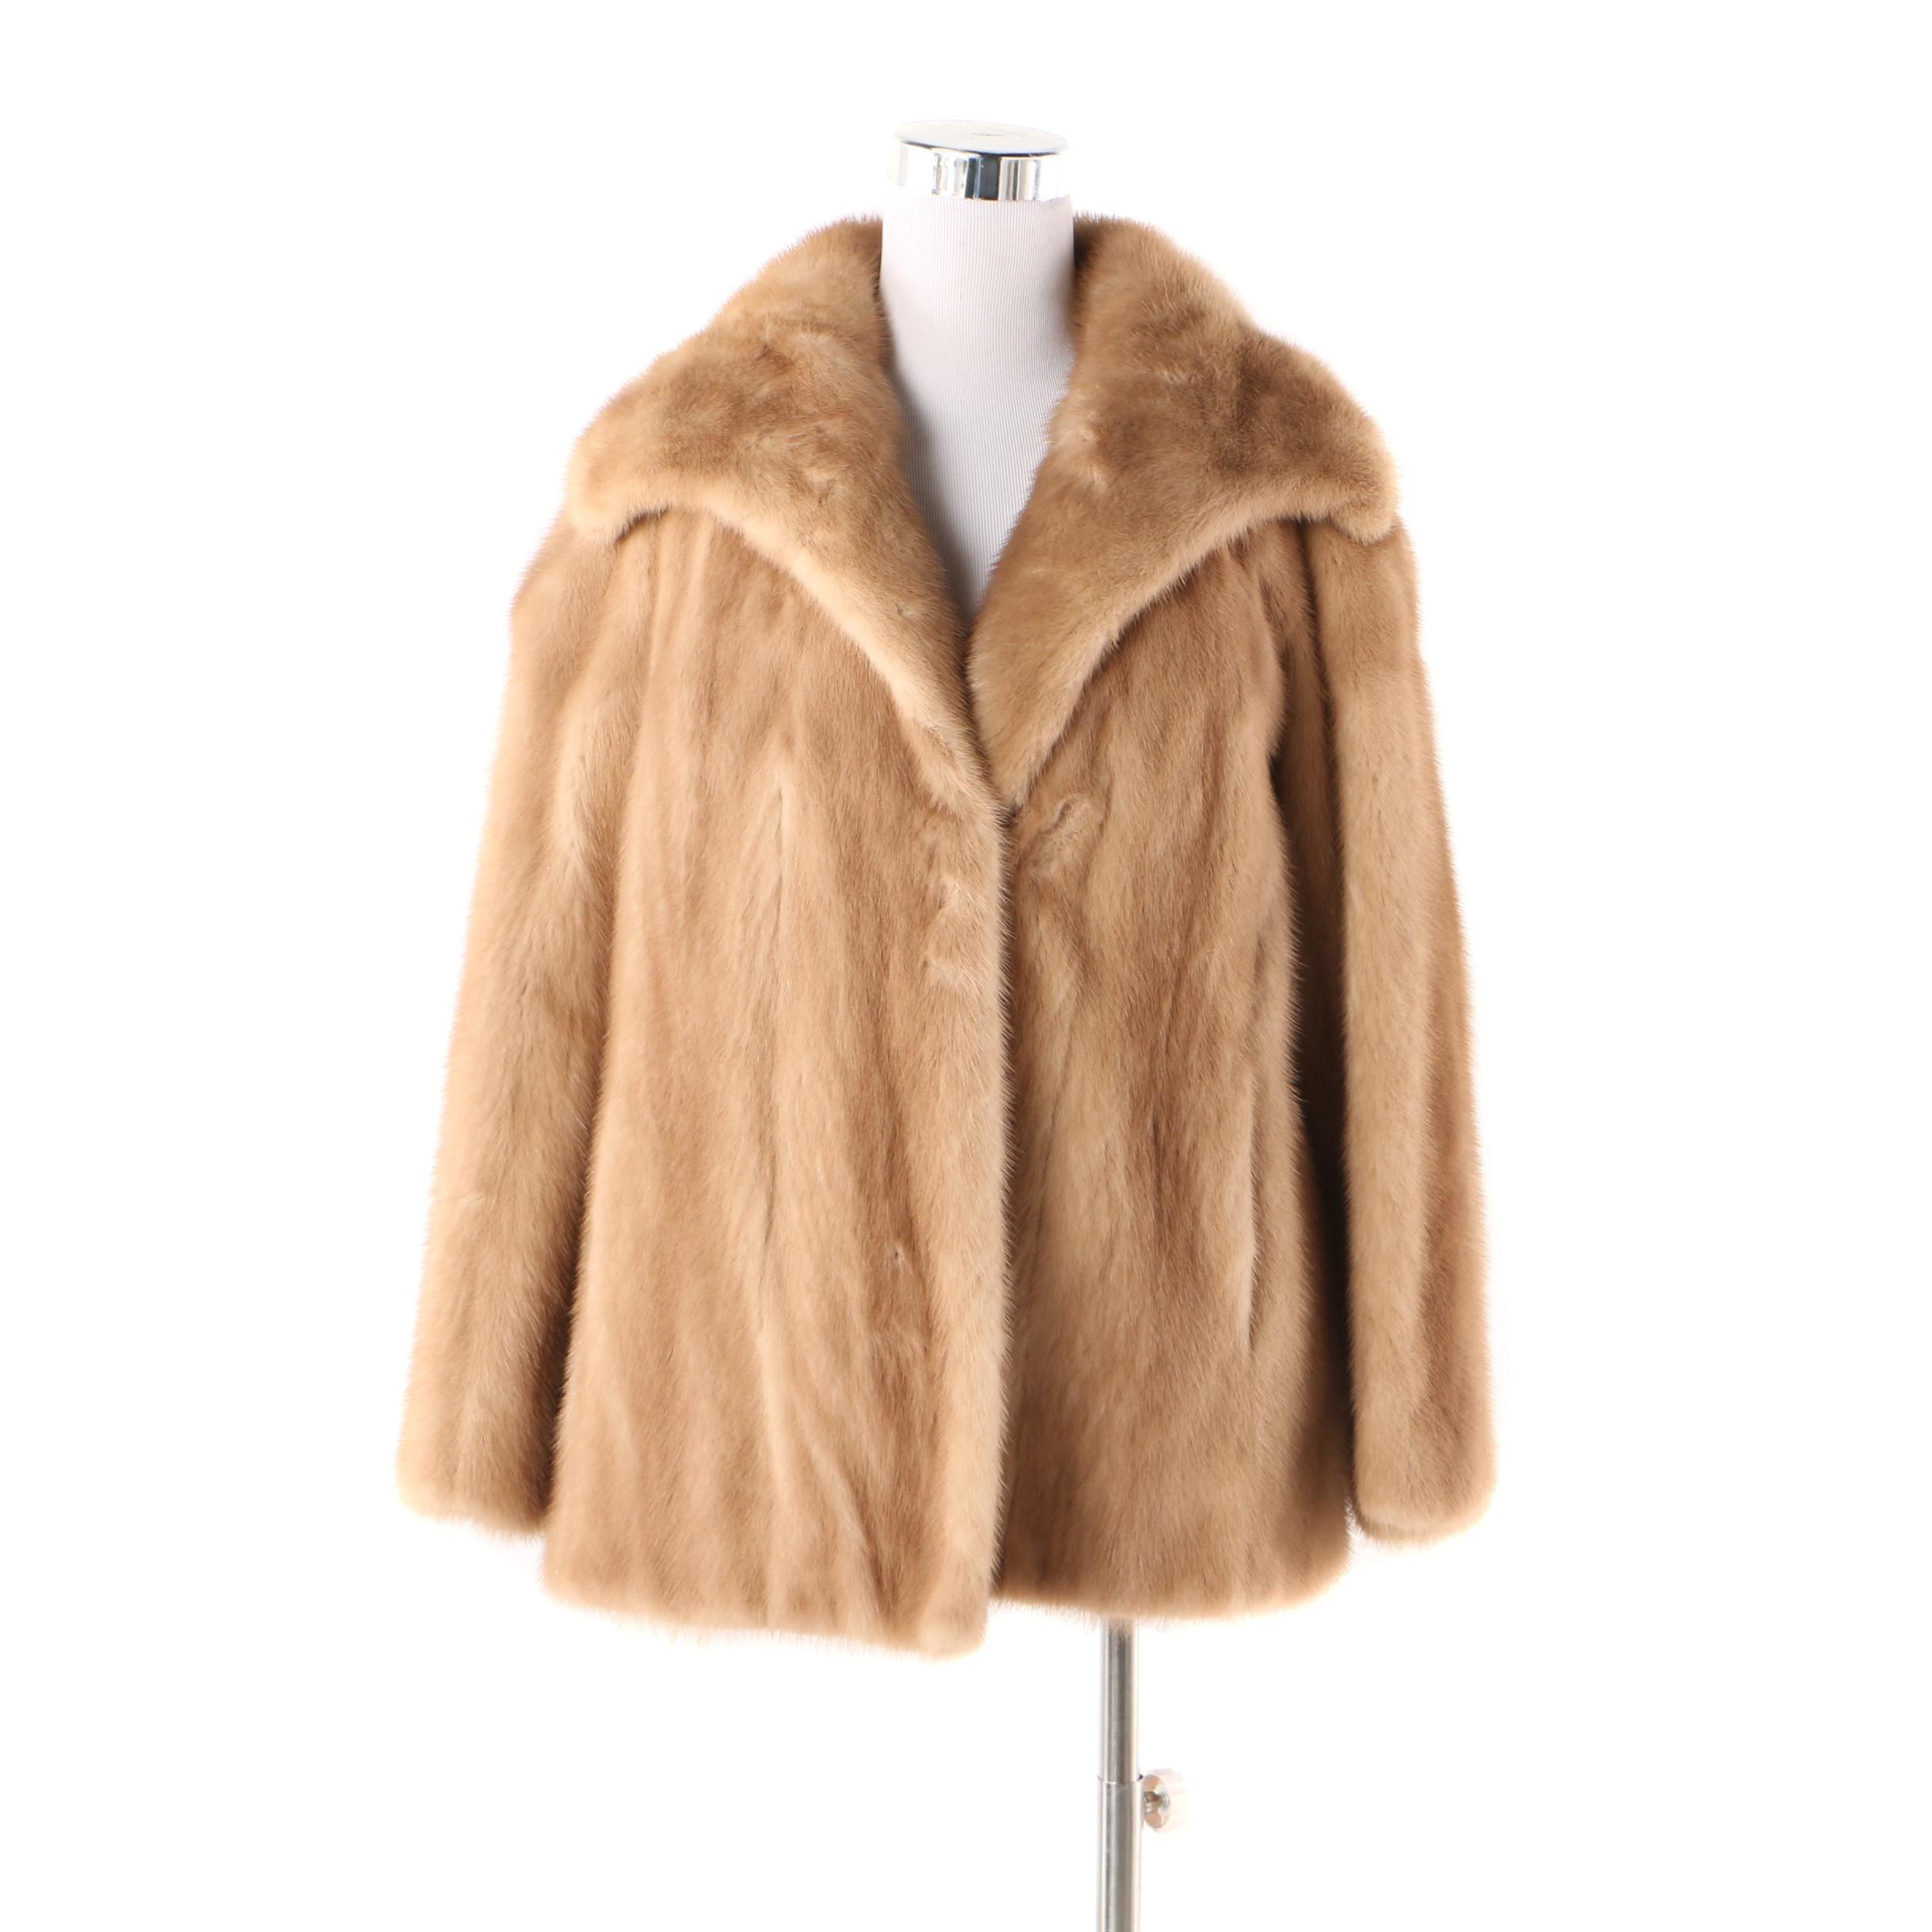 Women's Vintage The Minerva Collection by Evans Mink Fur Coat